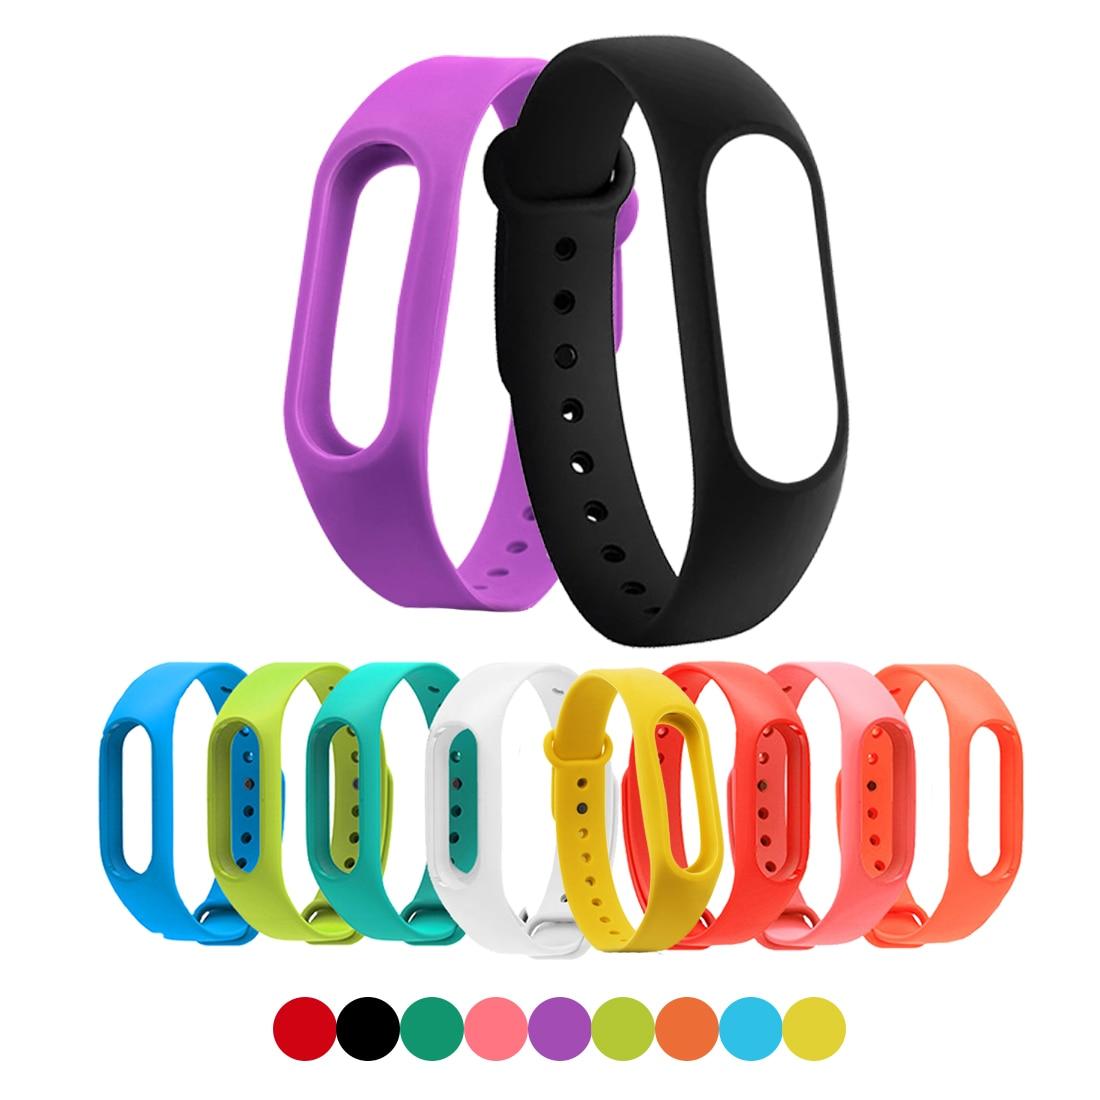 Hot 1 pcs Smart Wristband Band Strap For Xiaomi Mi Band 2 Smart Bracelet Miband 2